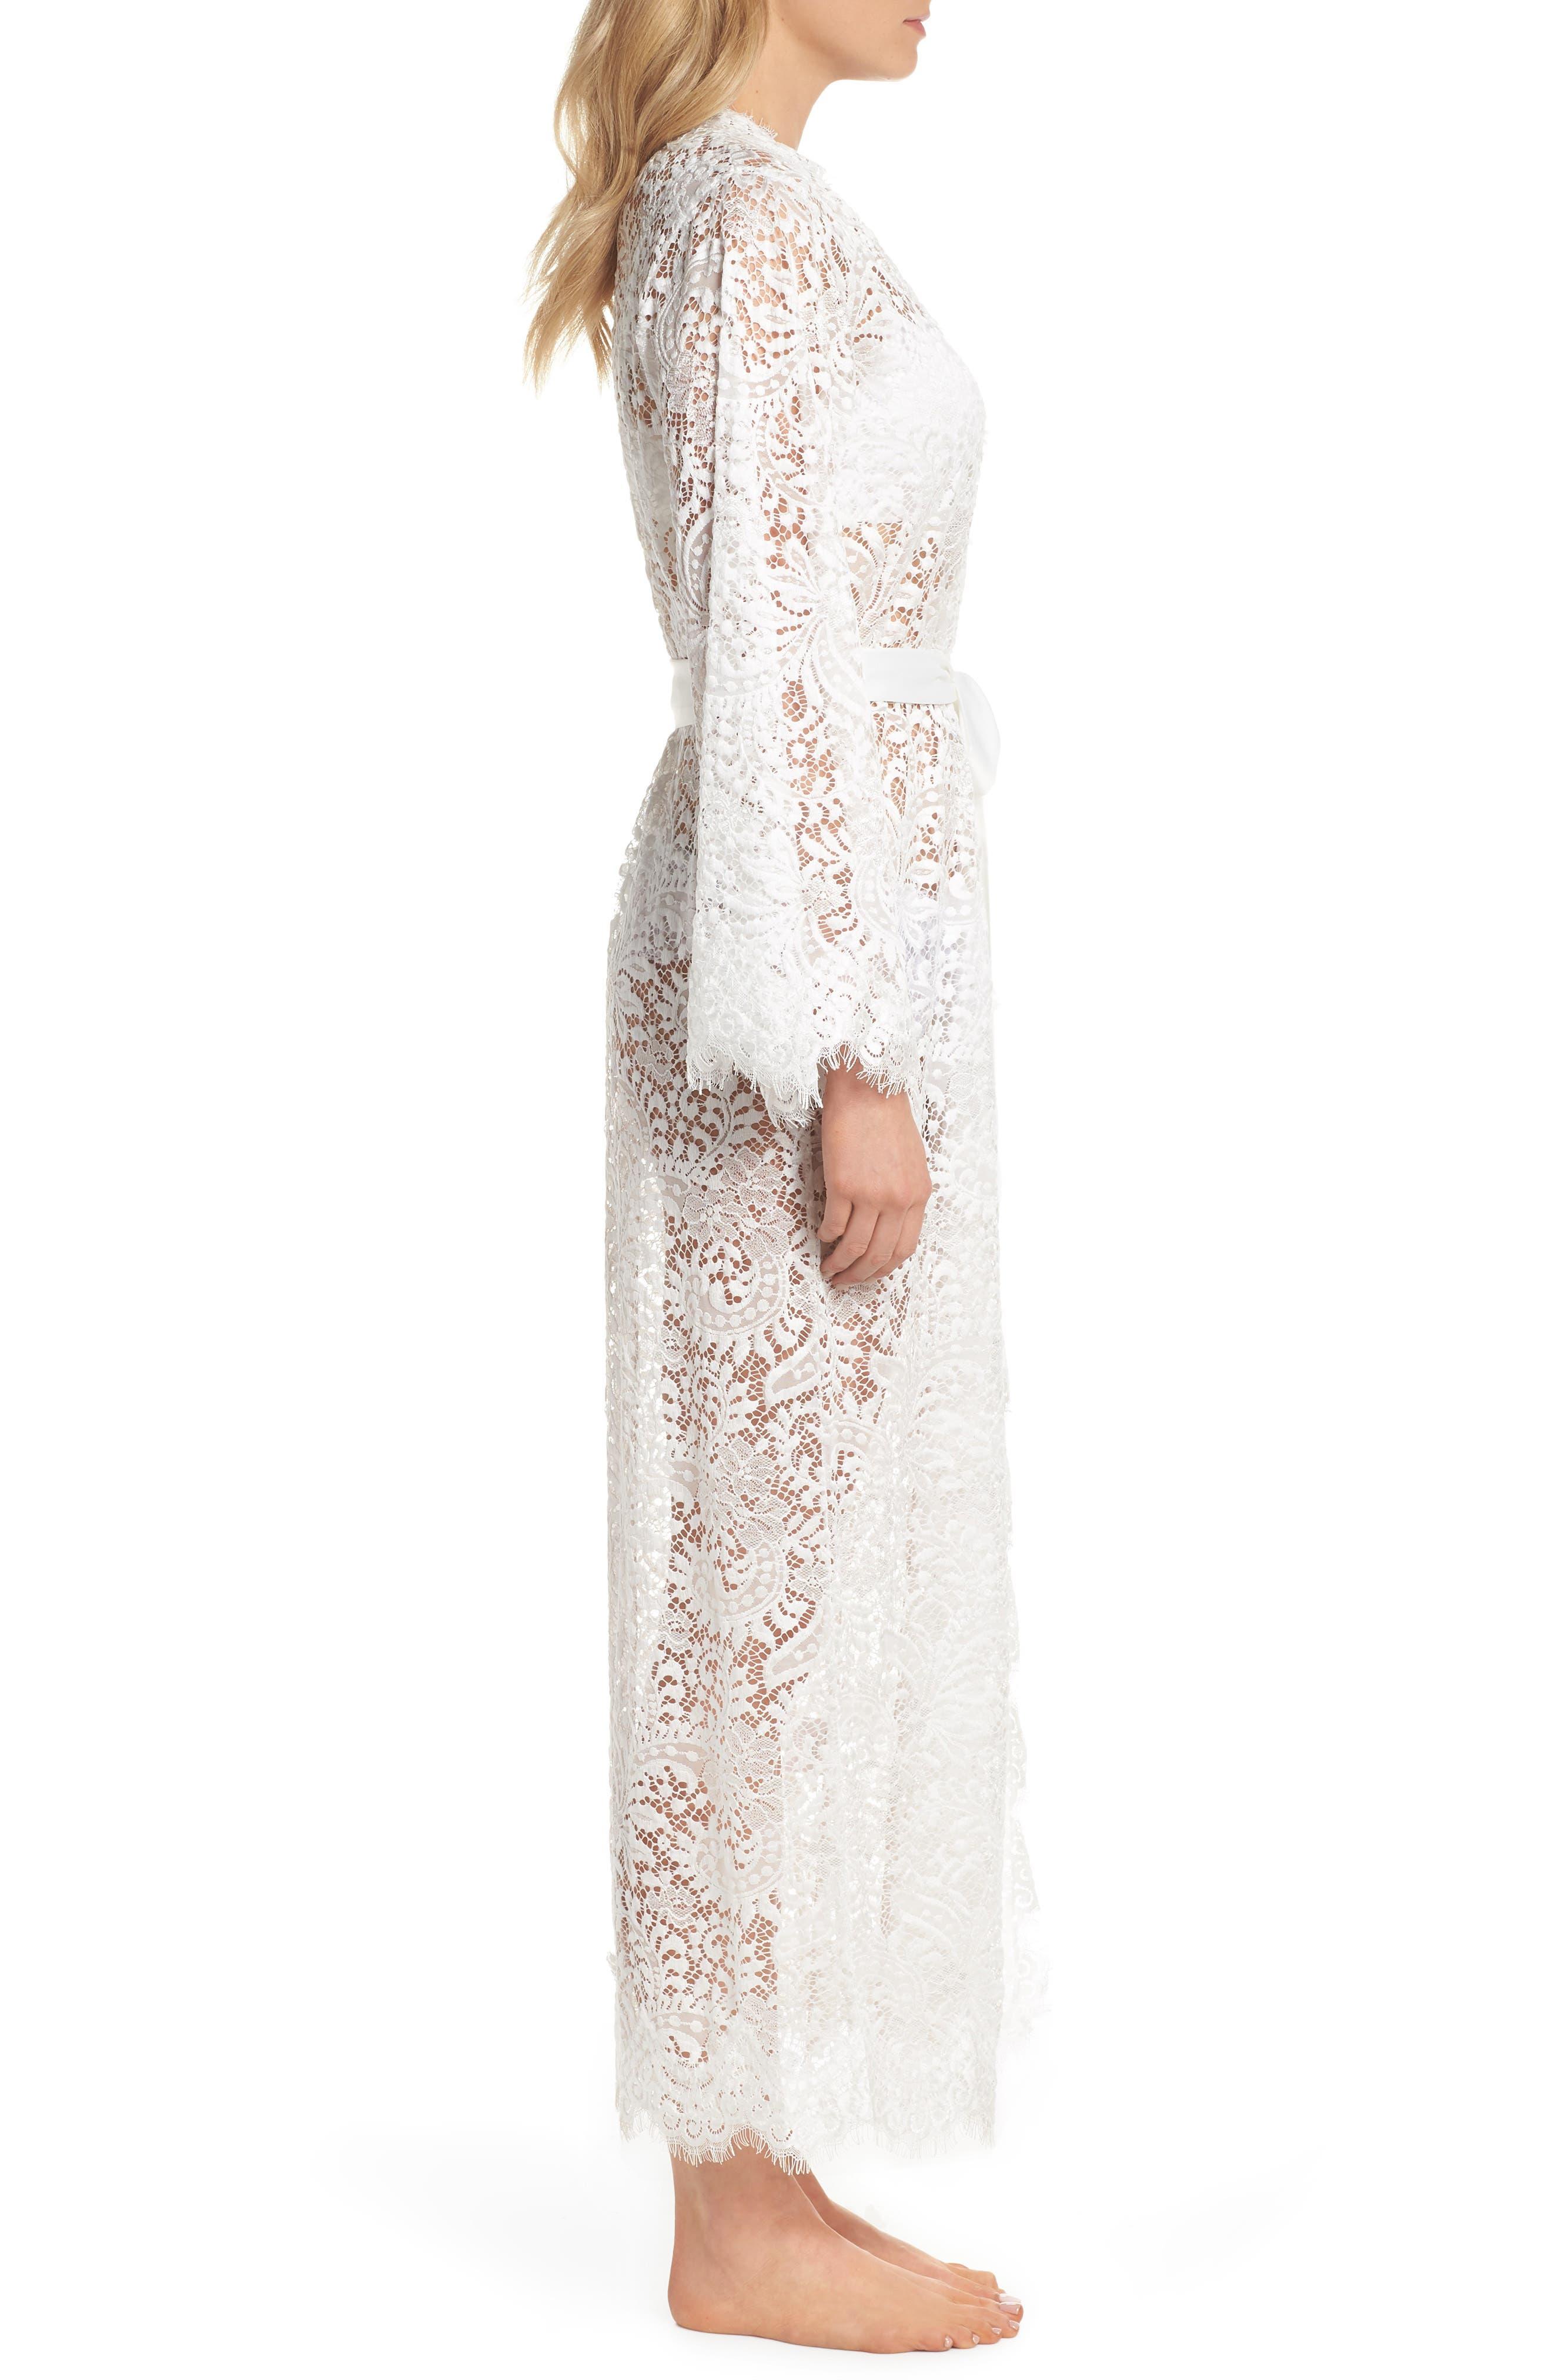 HOMEBODII,                             Anemone Long Lace Wrap,                             Alternate thumbnail 3, color,                             WHITE